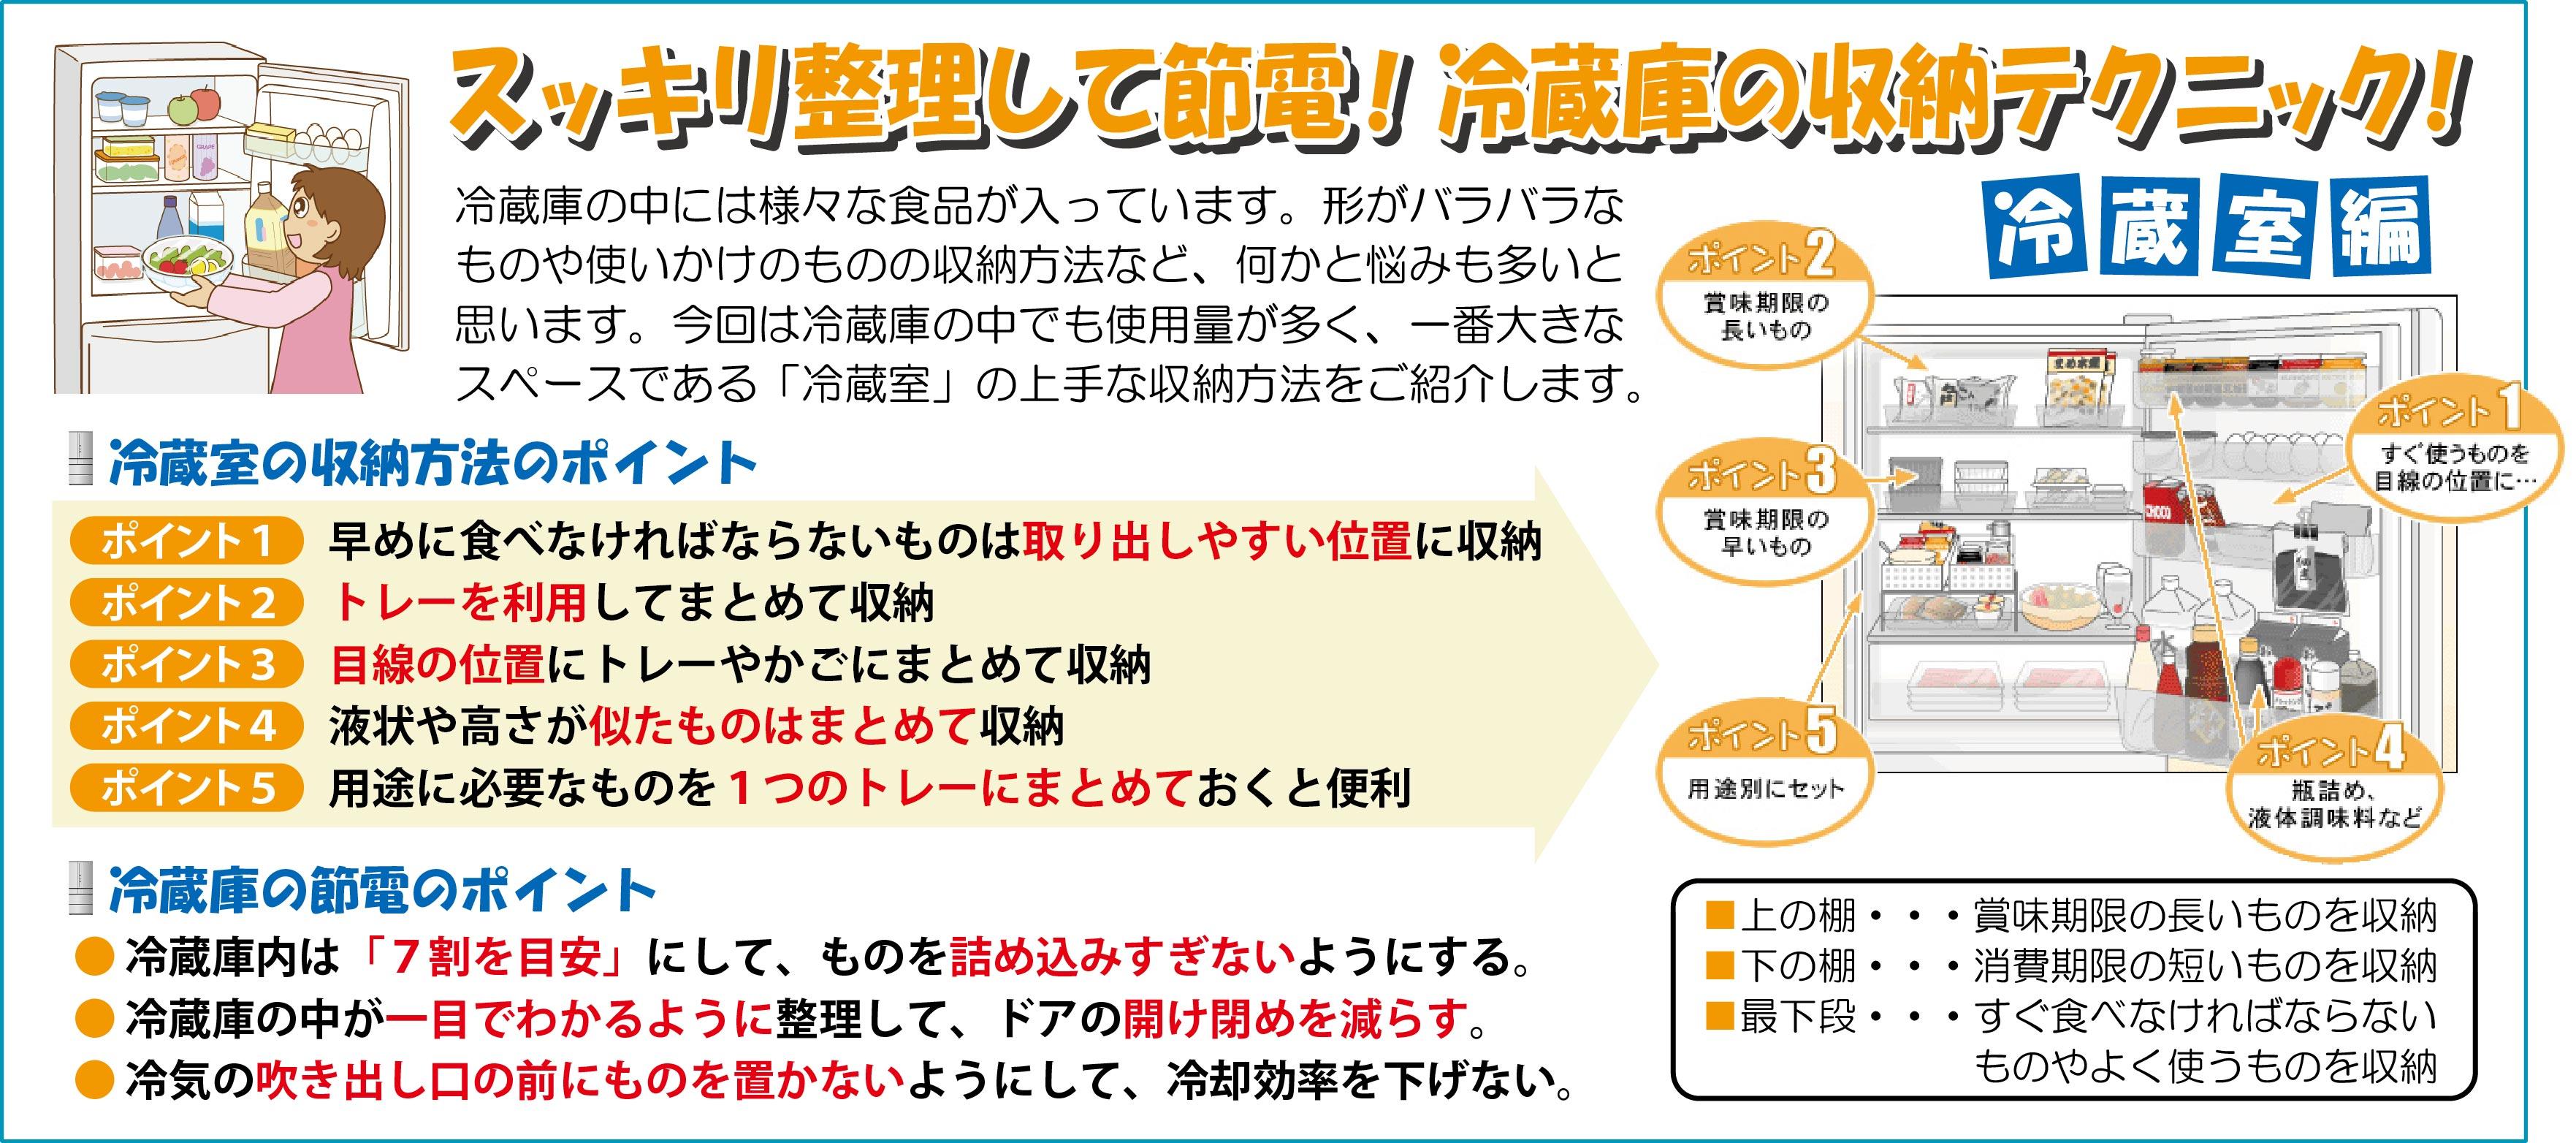 KuraSi-natu-sin87-13.jpg